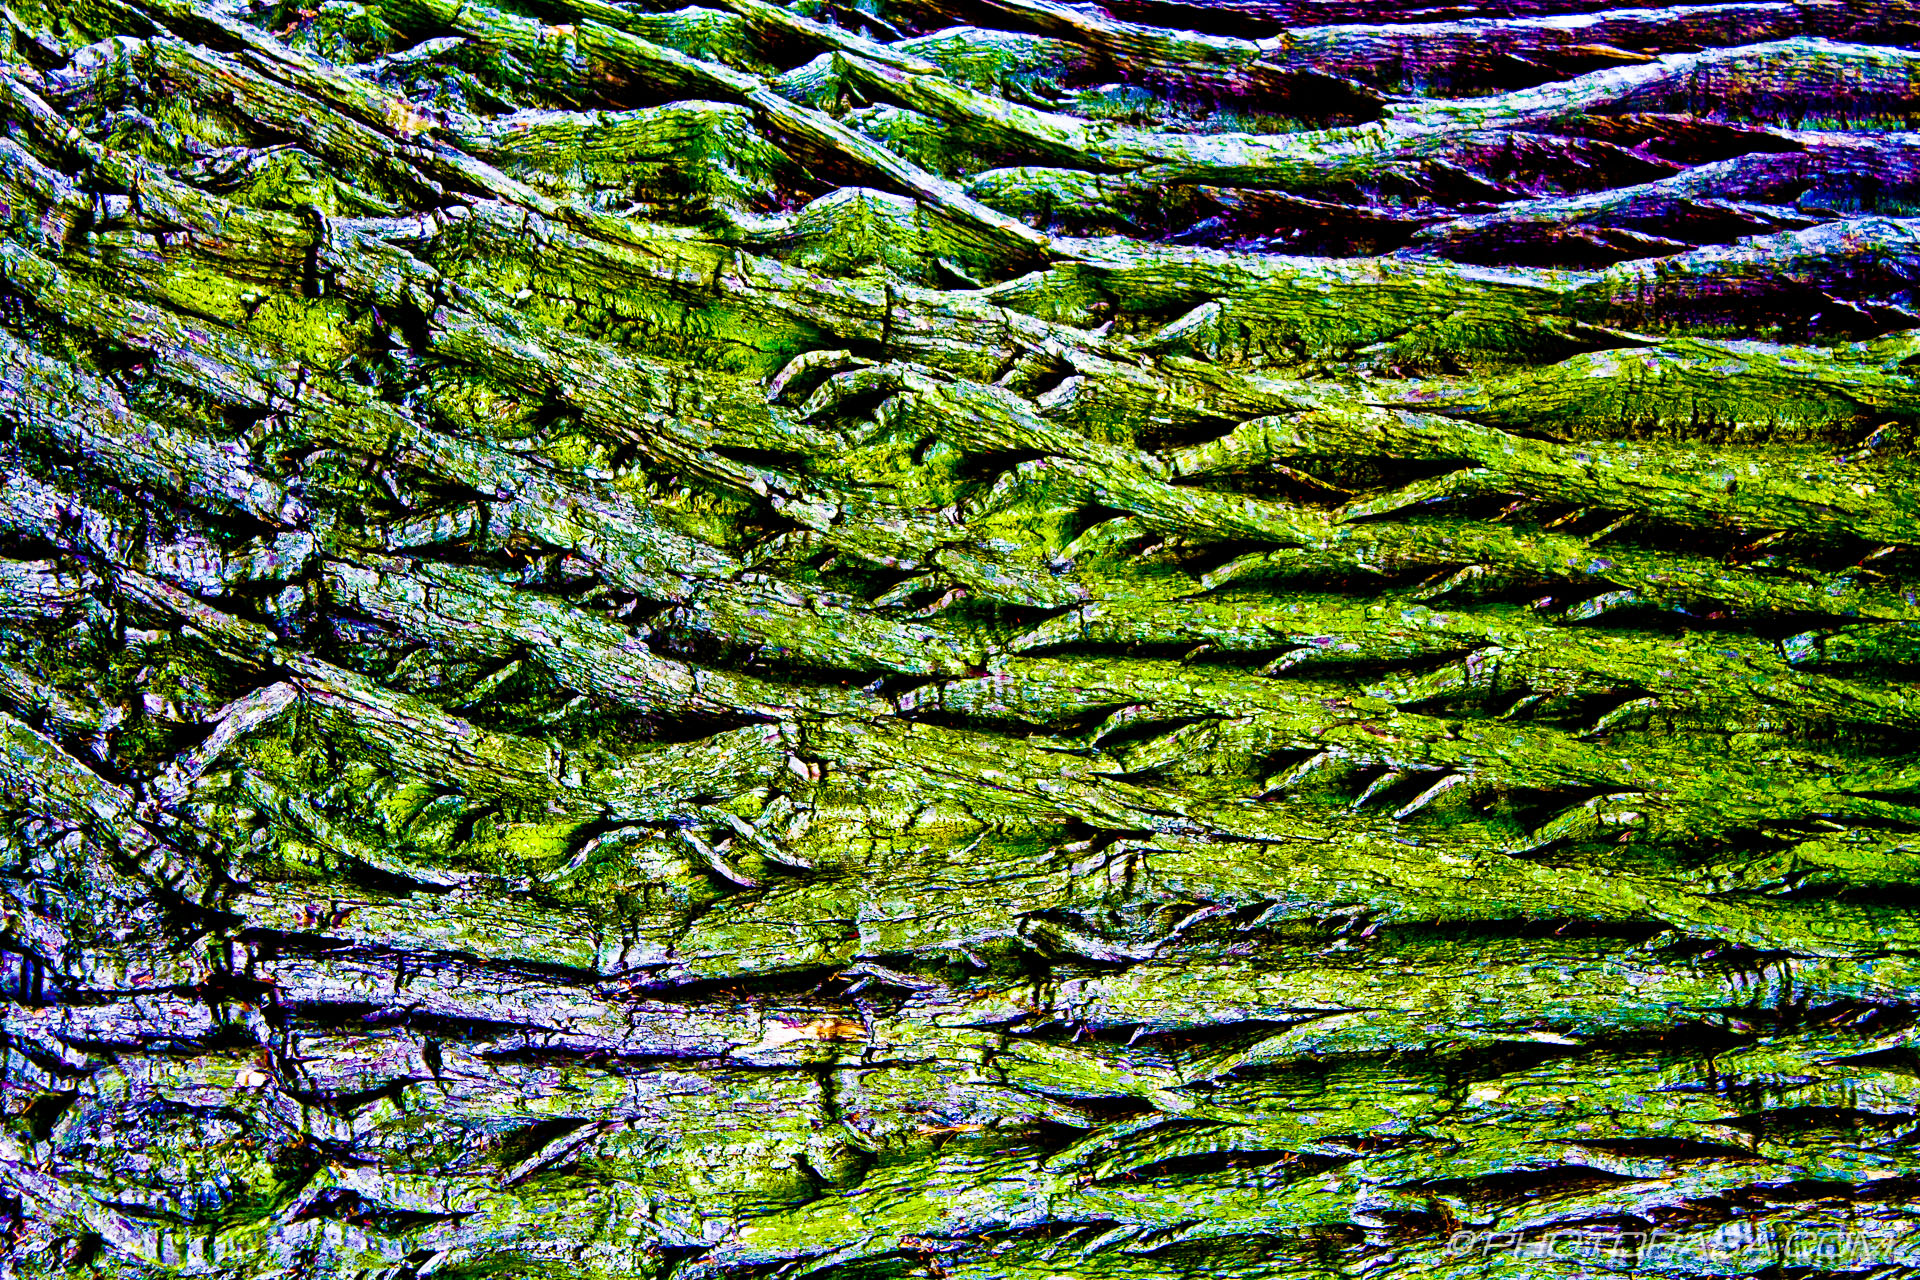 https://photorasa.com/wood-and-bark-textures/trunk-criss-cross-pattern/